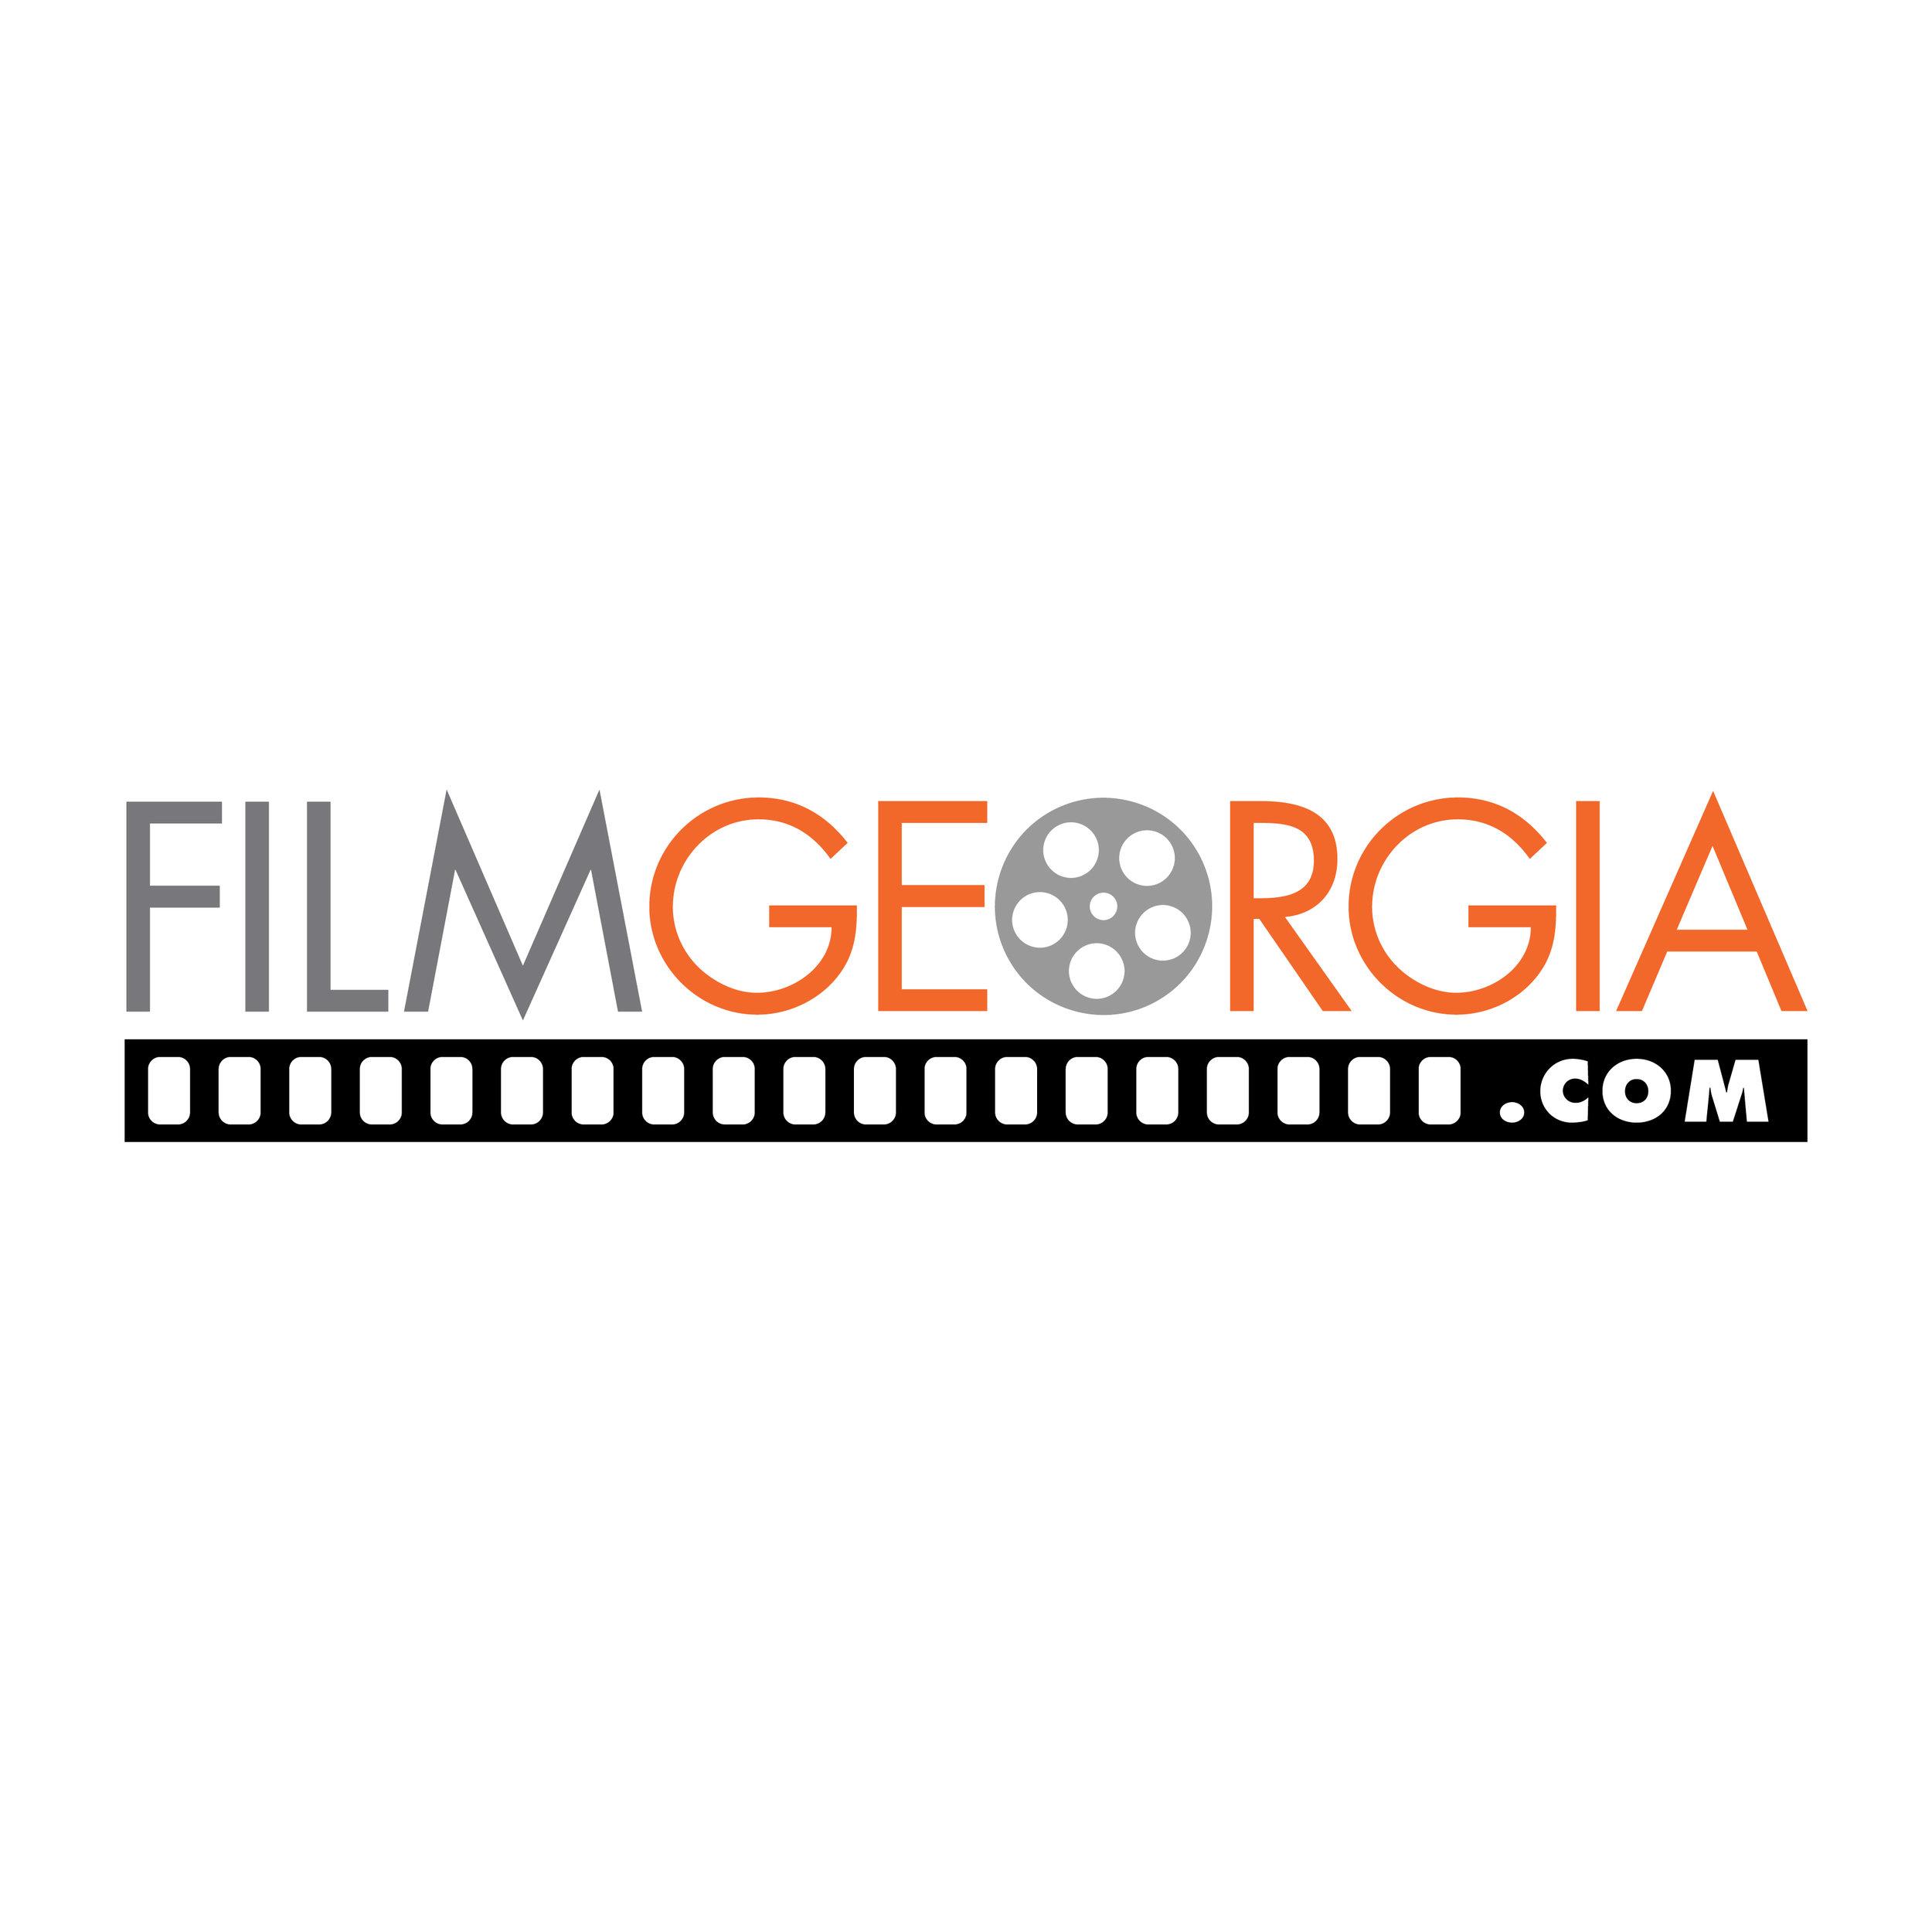 FilmGA_Hor_Color.jpg